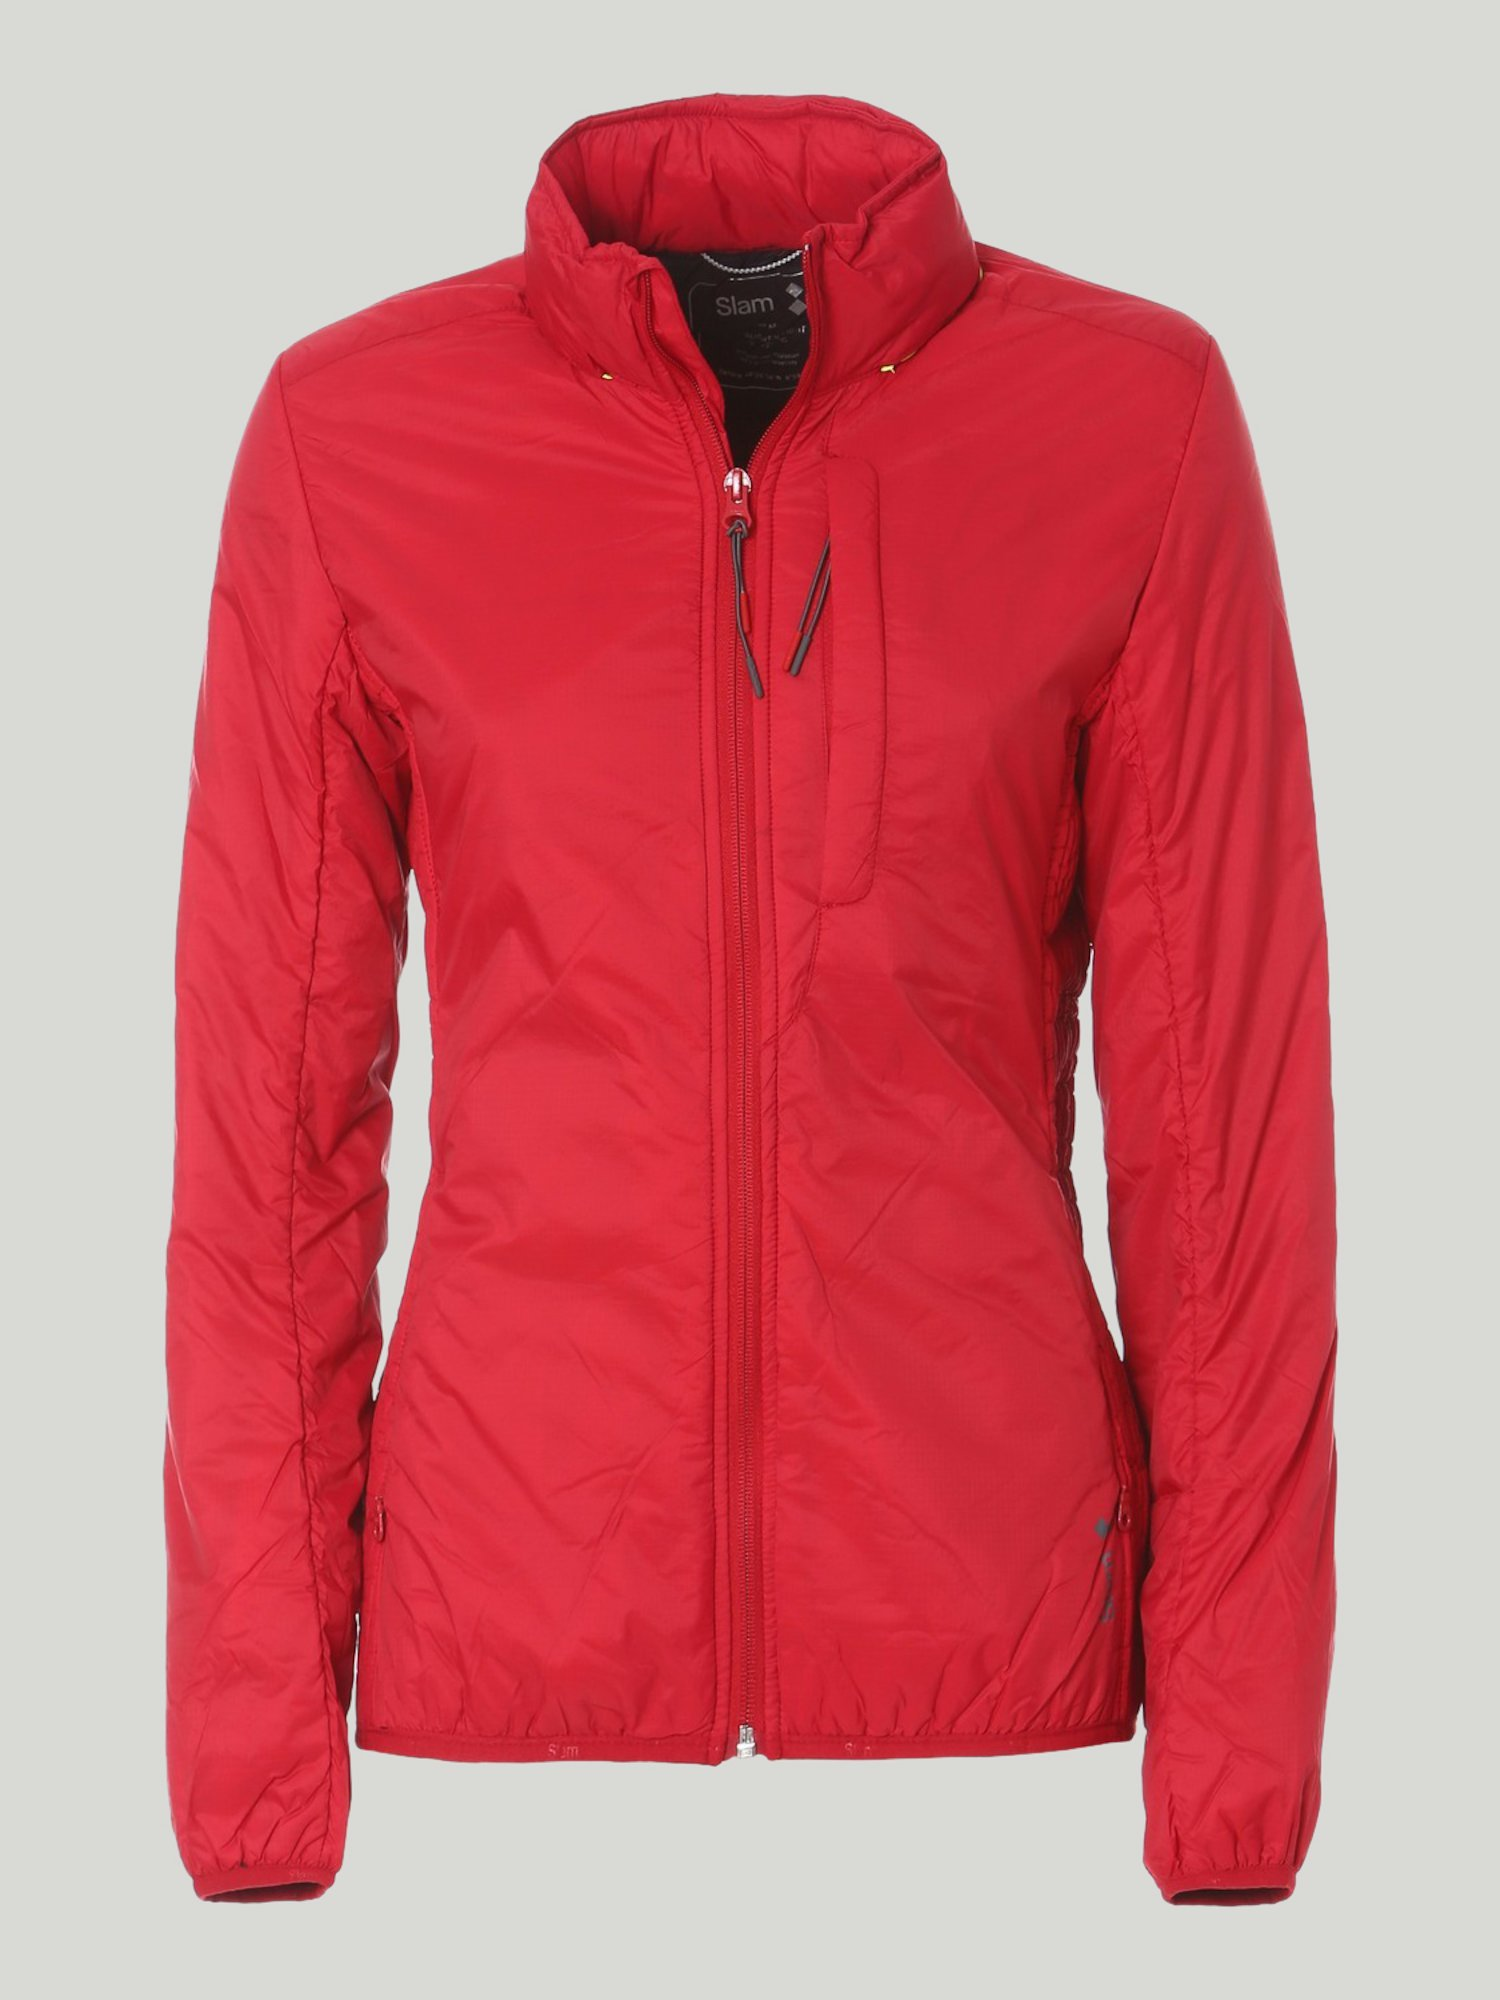 Jkt Blow W's Evo jacket - Chili Red